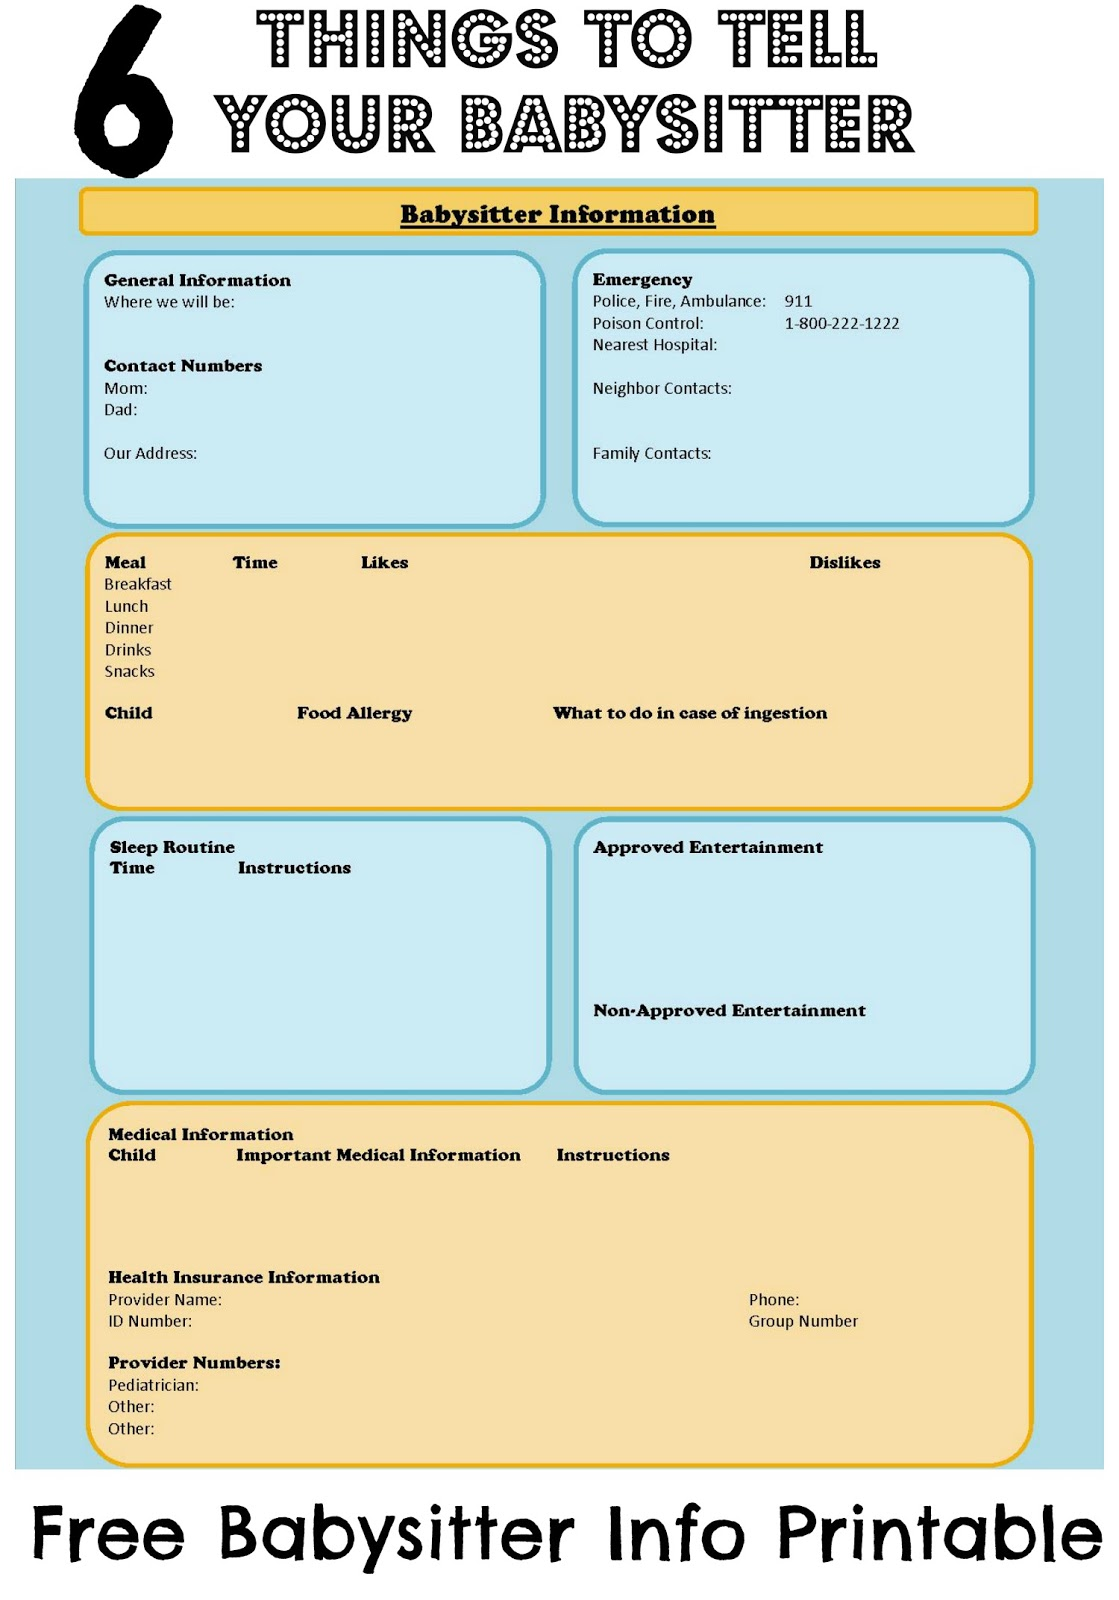 Babysitter Information Sheet with Free Printable – The Bajan Texan